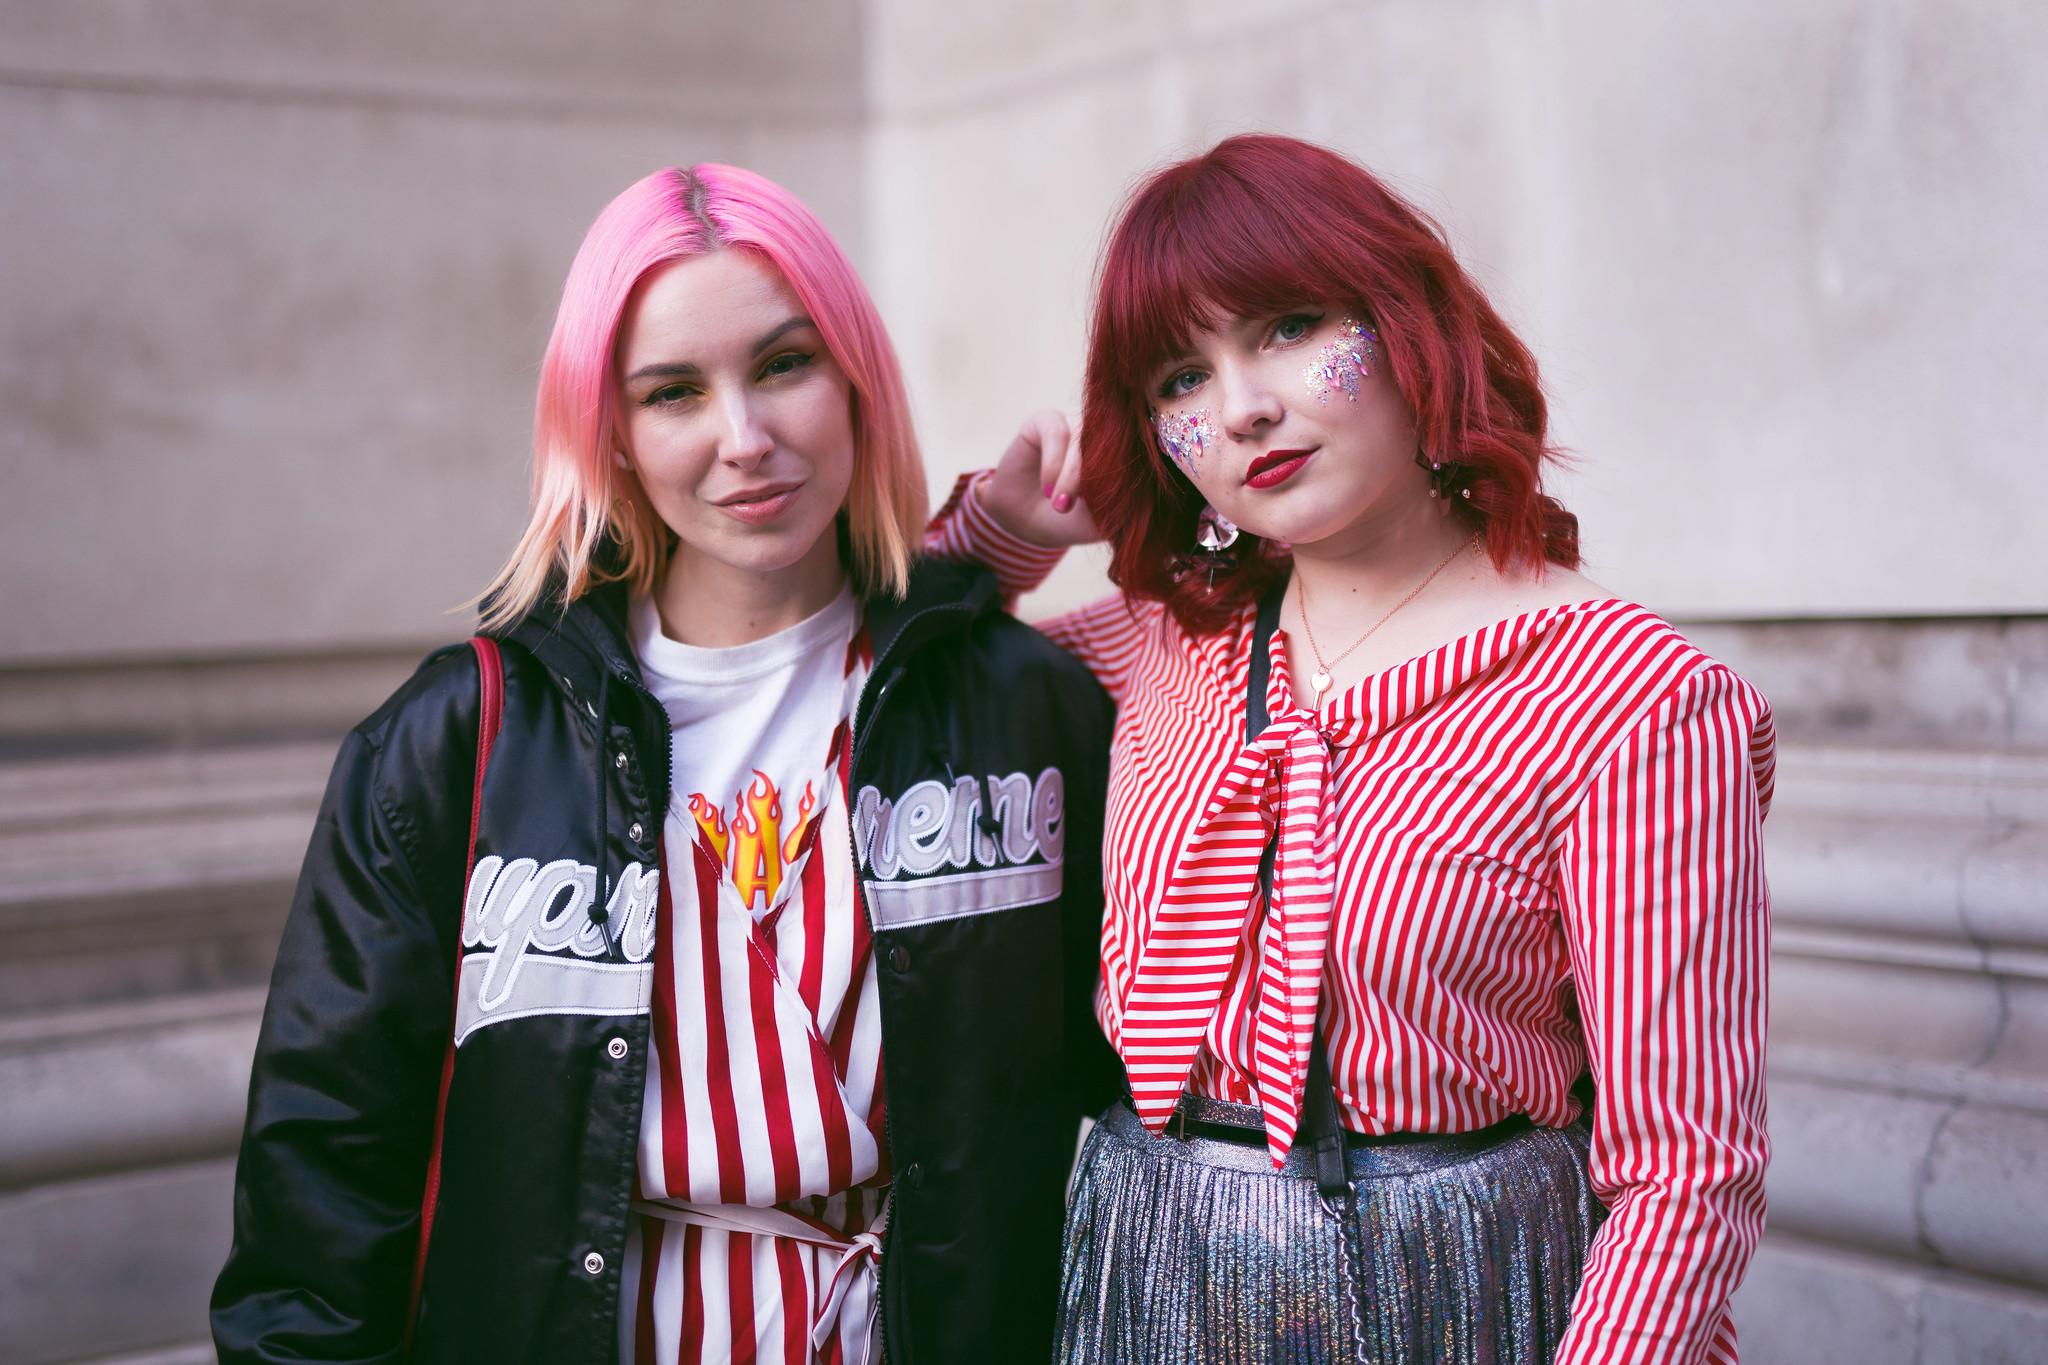 Kitty Cowell & Paige Calvert